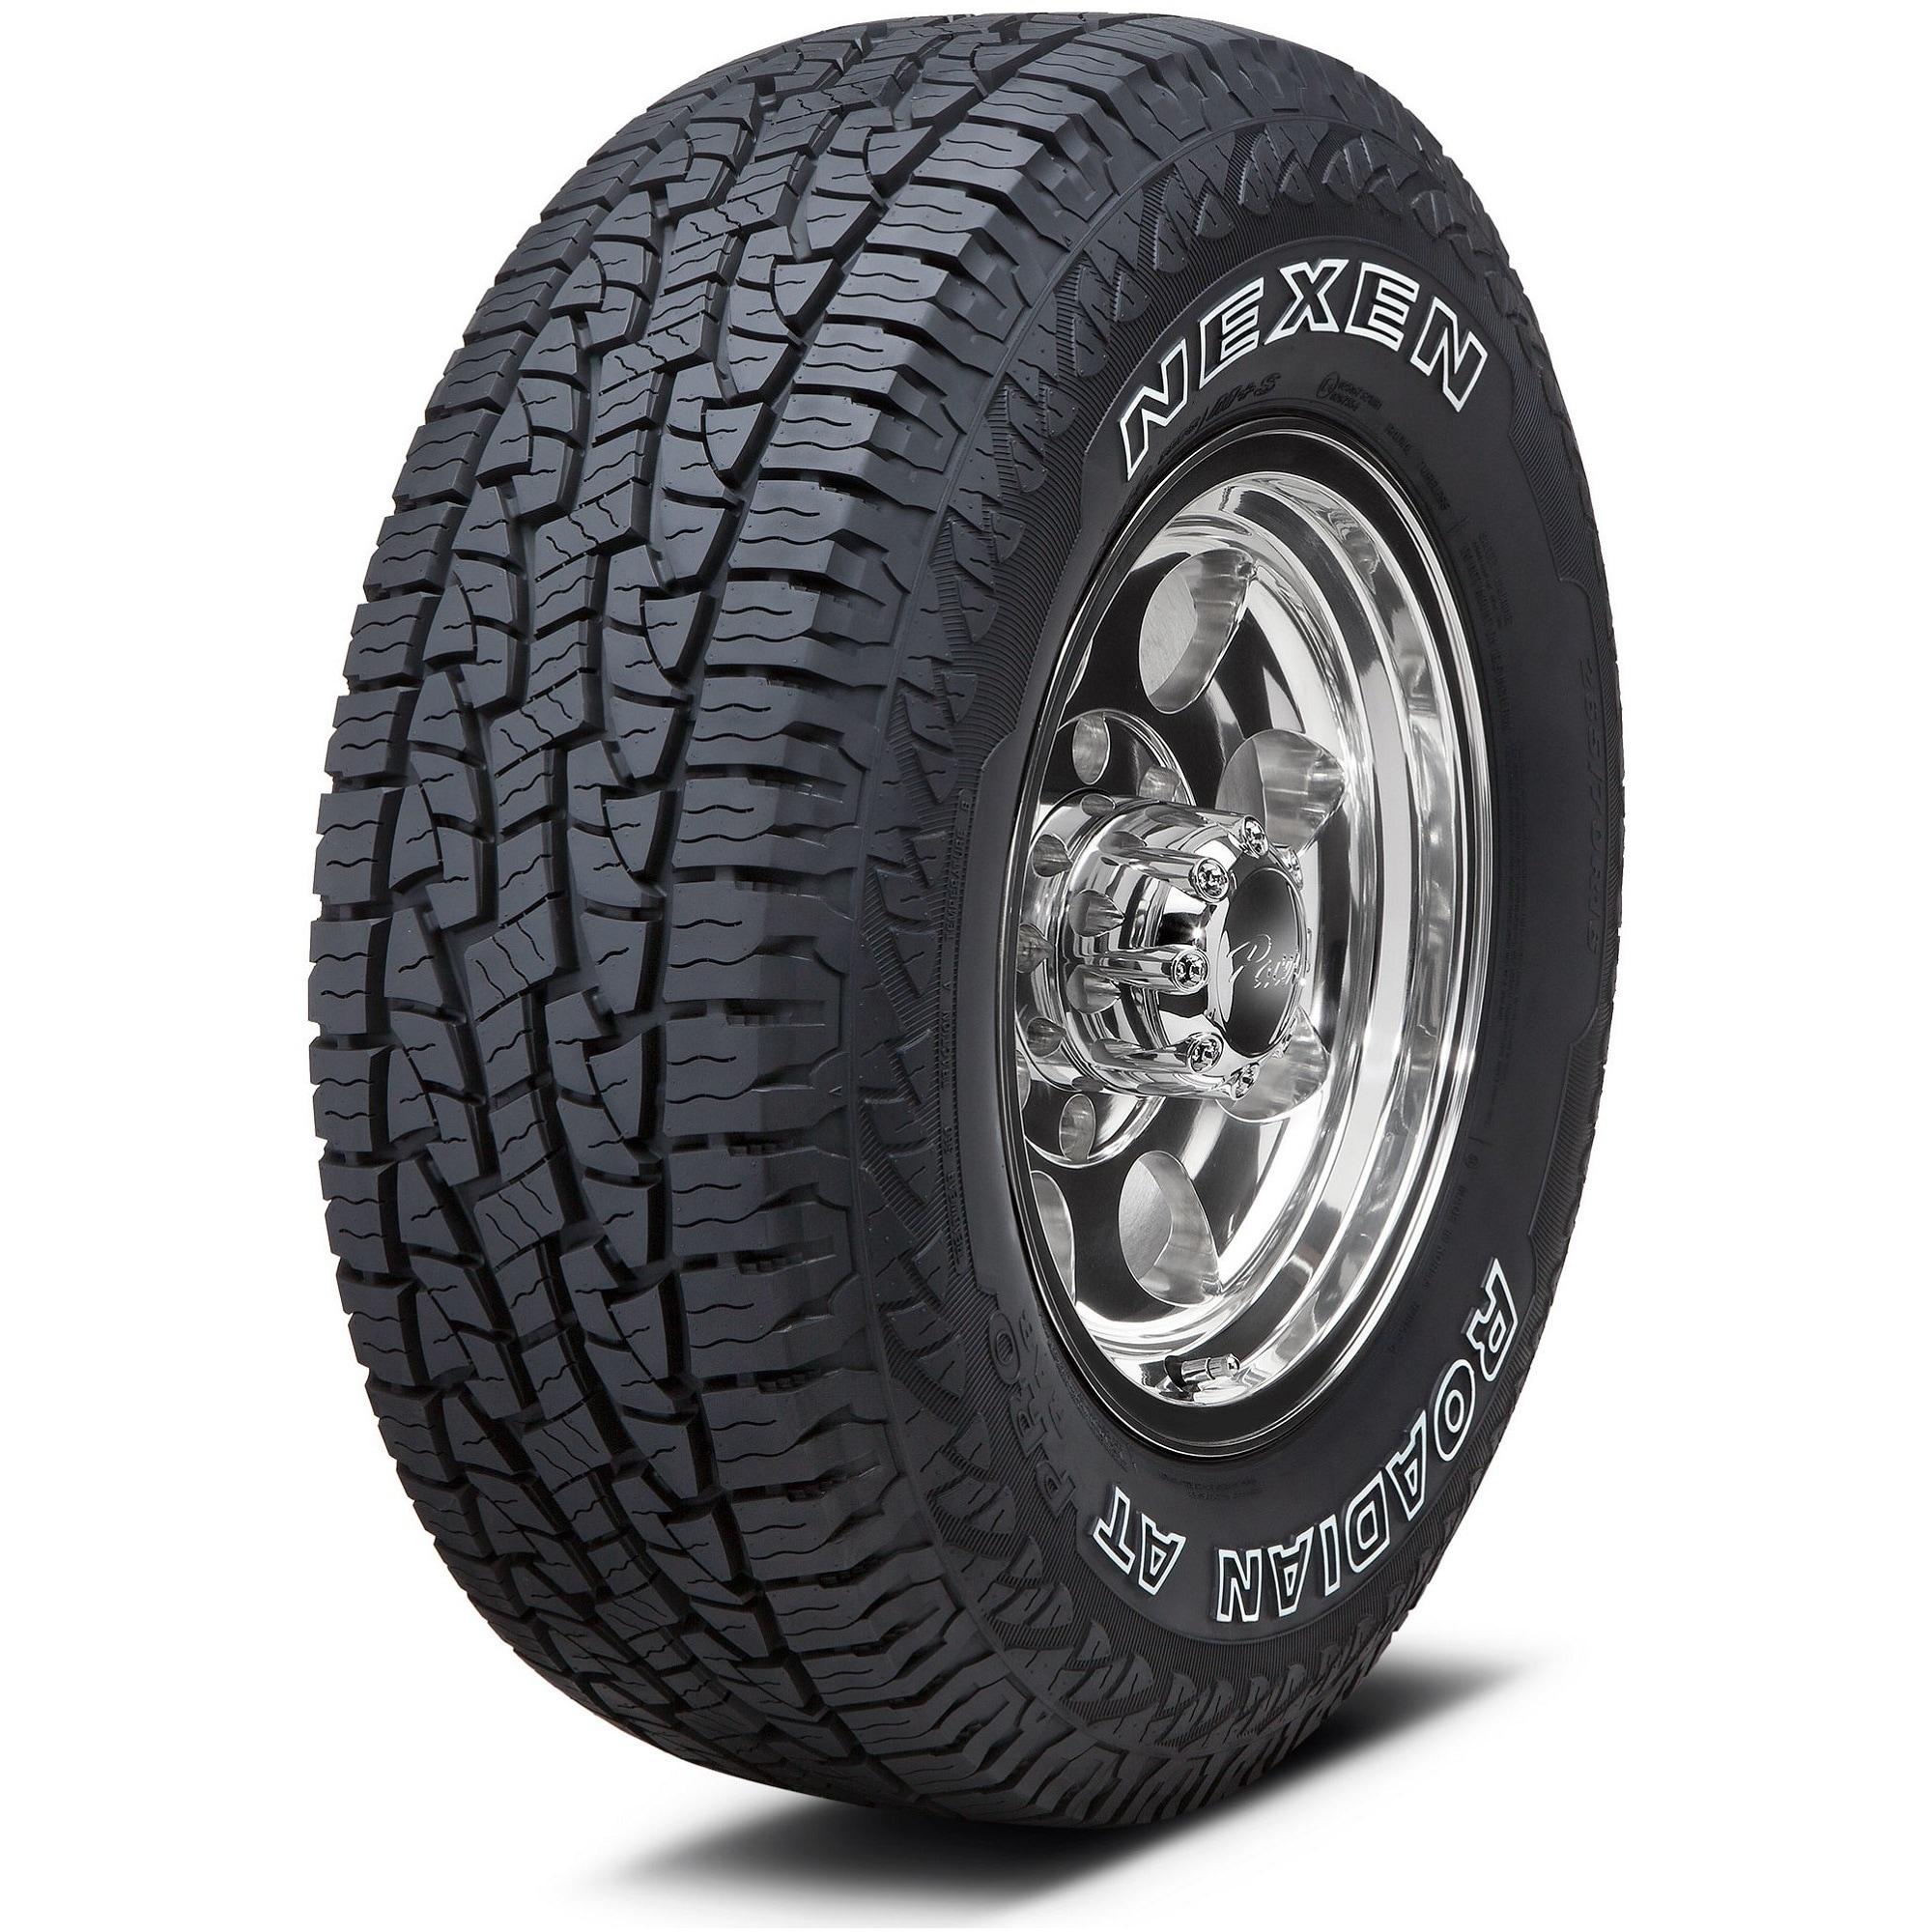 Nexen Roadian AT Pro RA8 All Terrain Tire - 255/70R16 111...